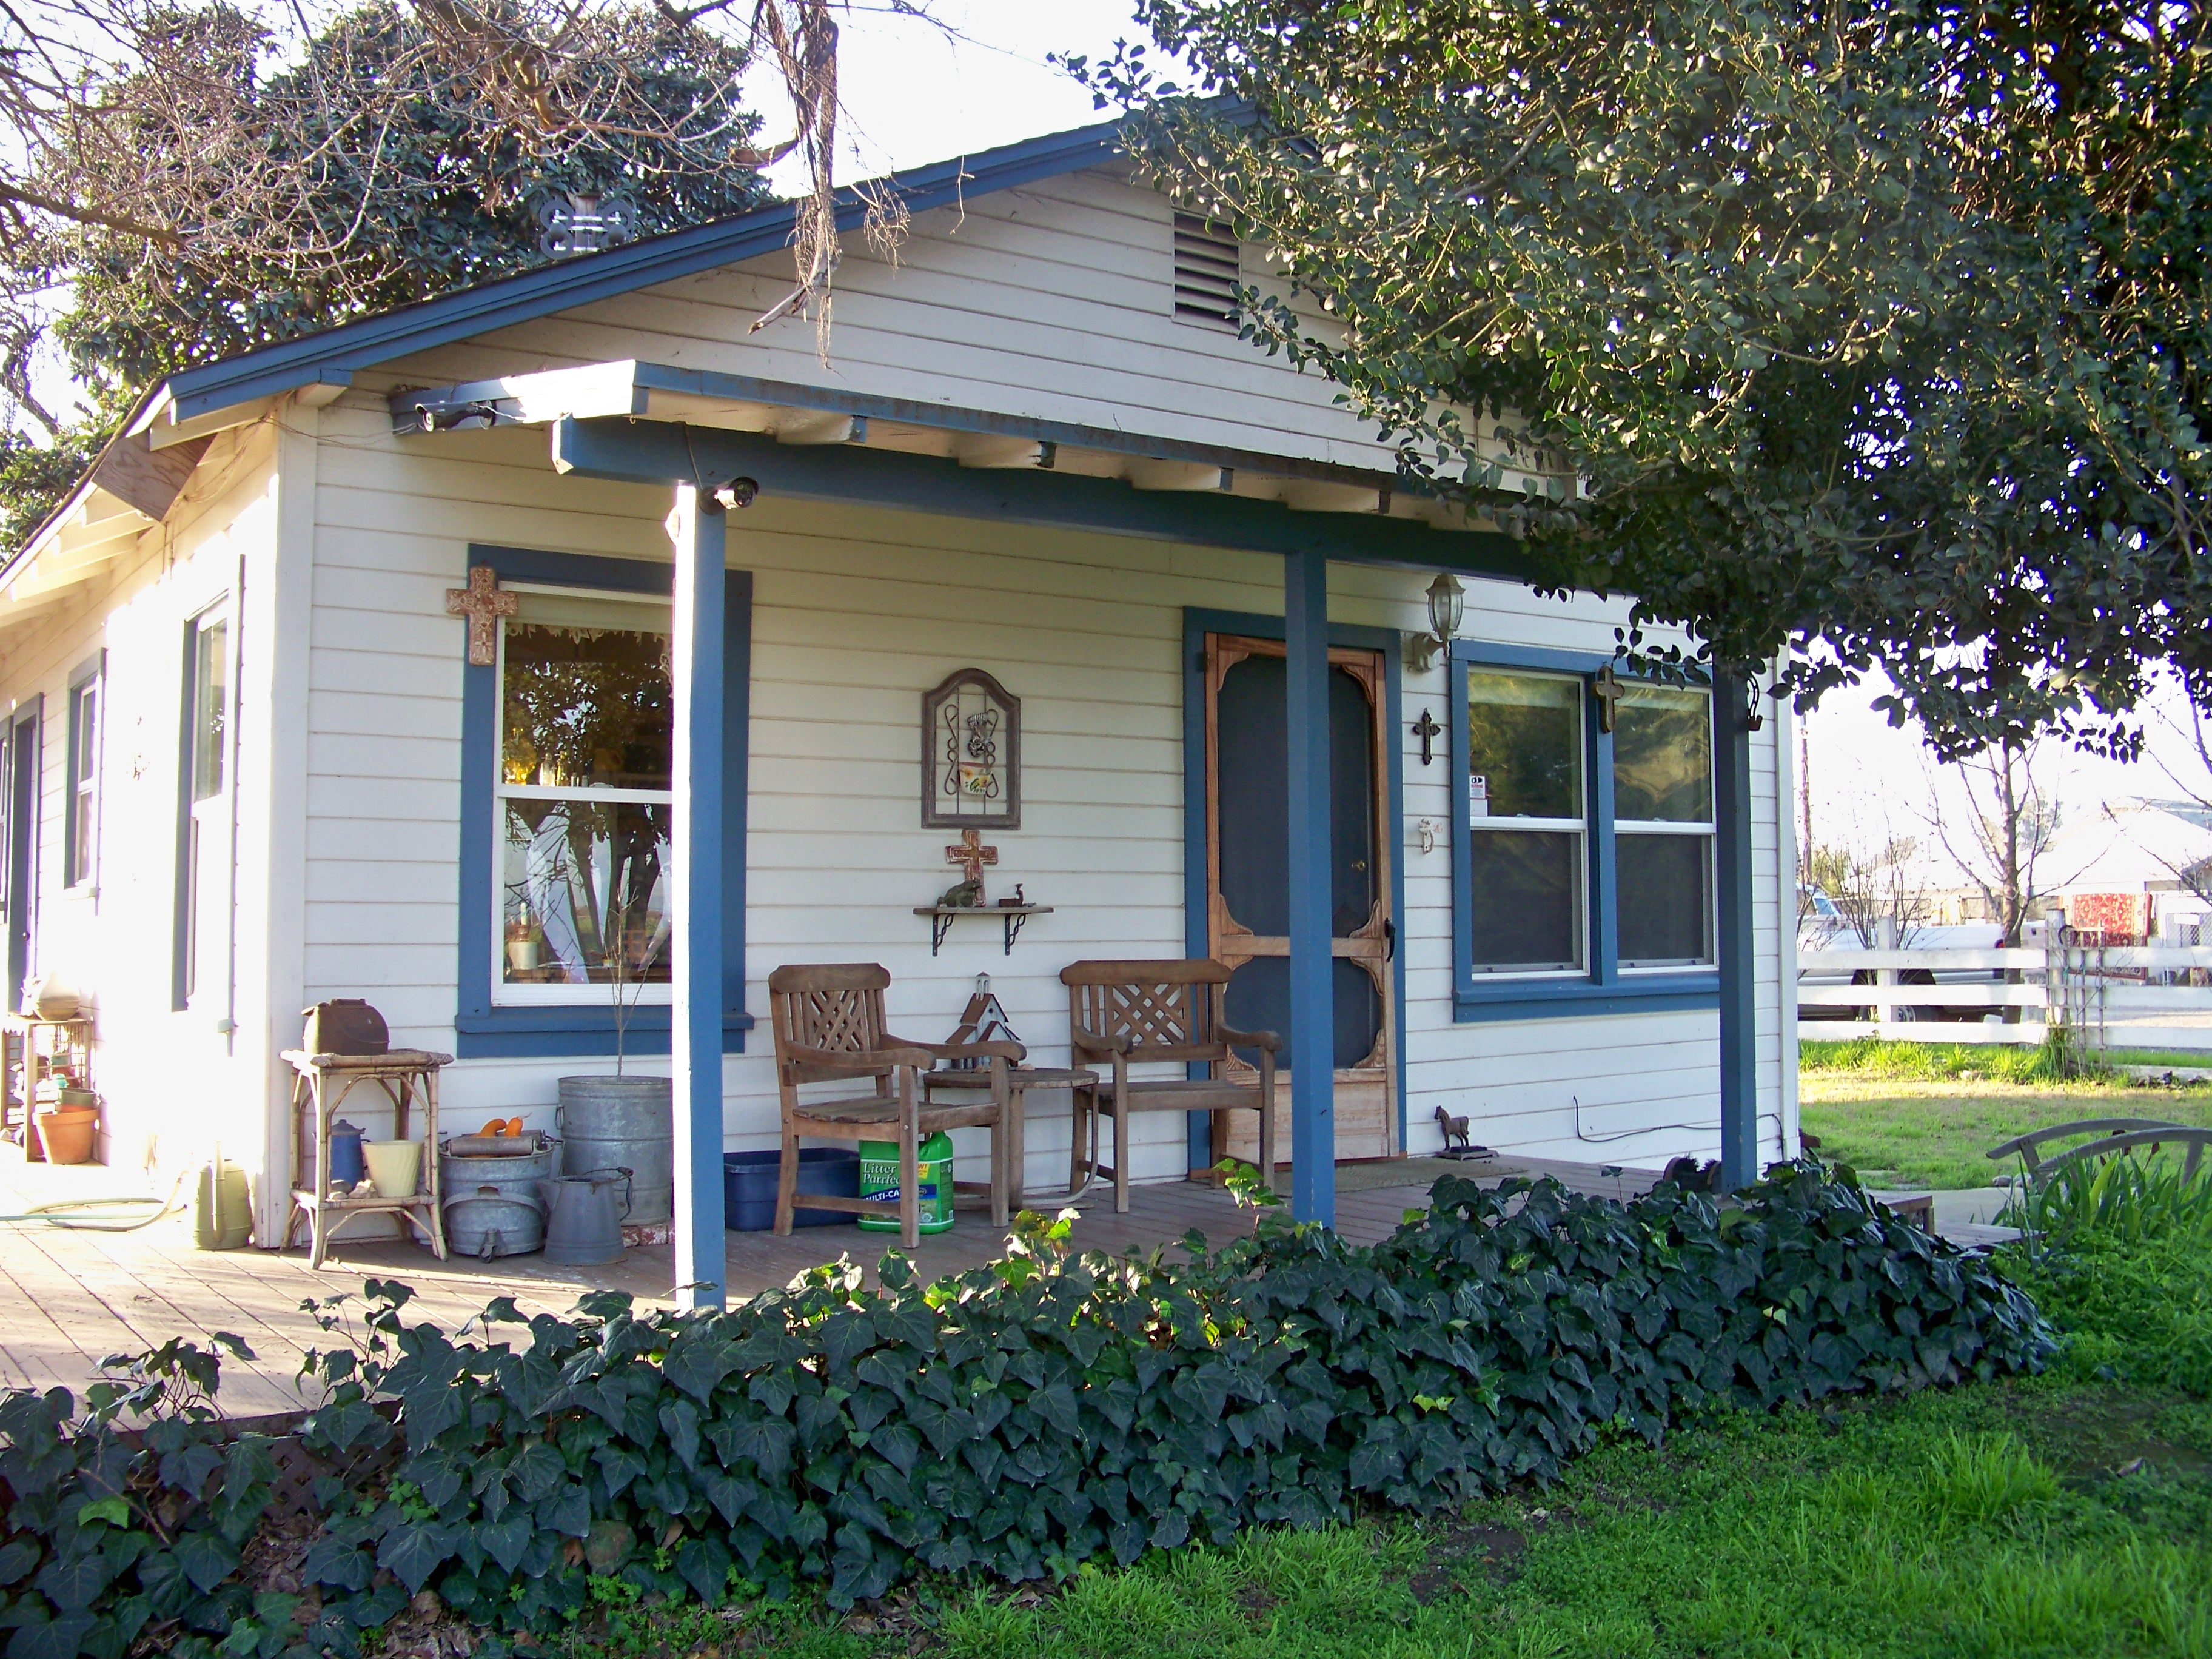 22766 Robertson Blvd, Chowchilla, California 93610